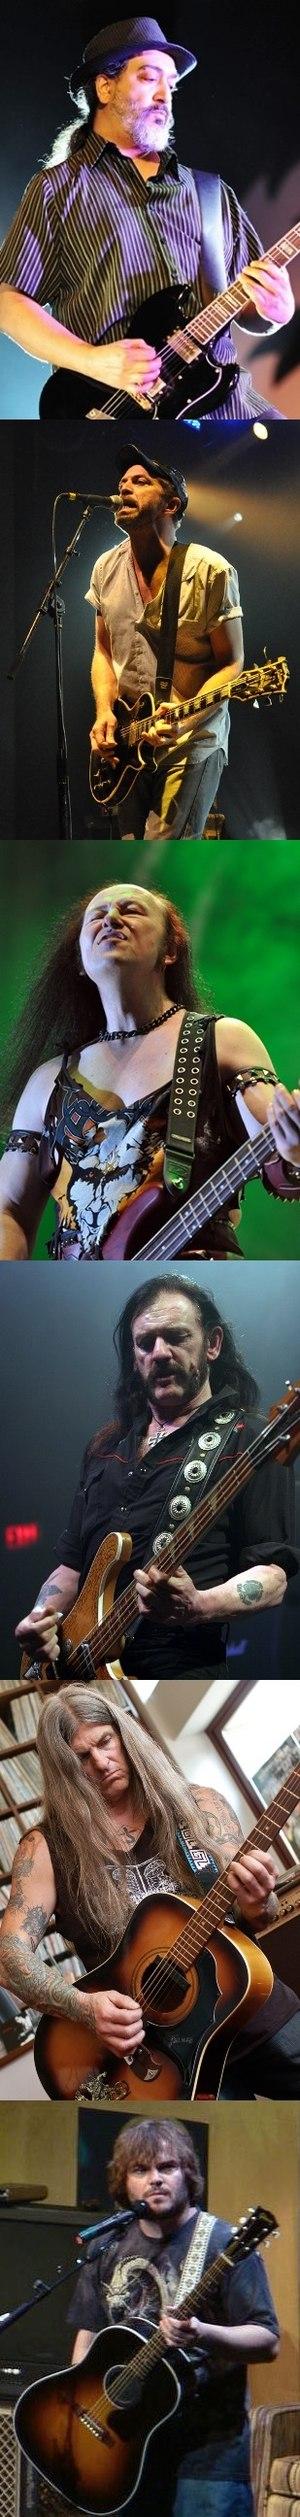 Probot - Image: Probot guitarists